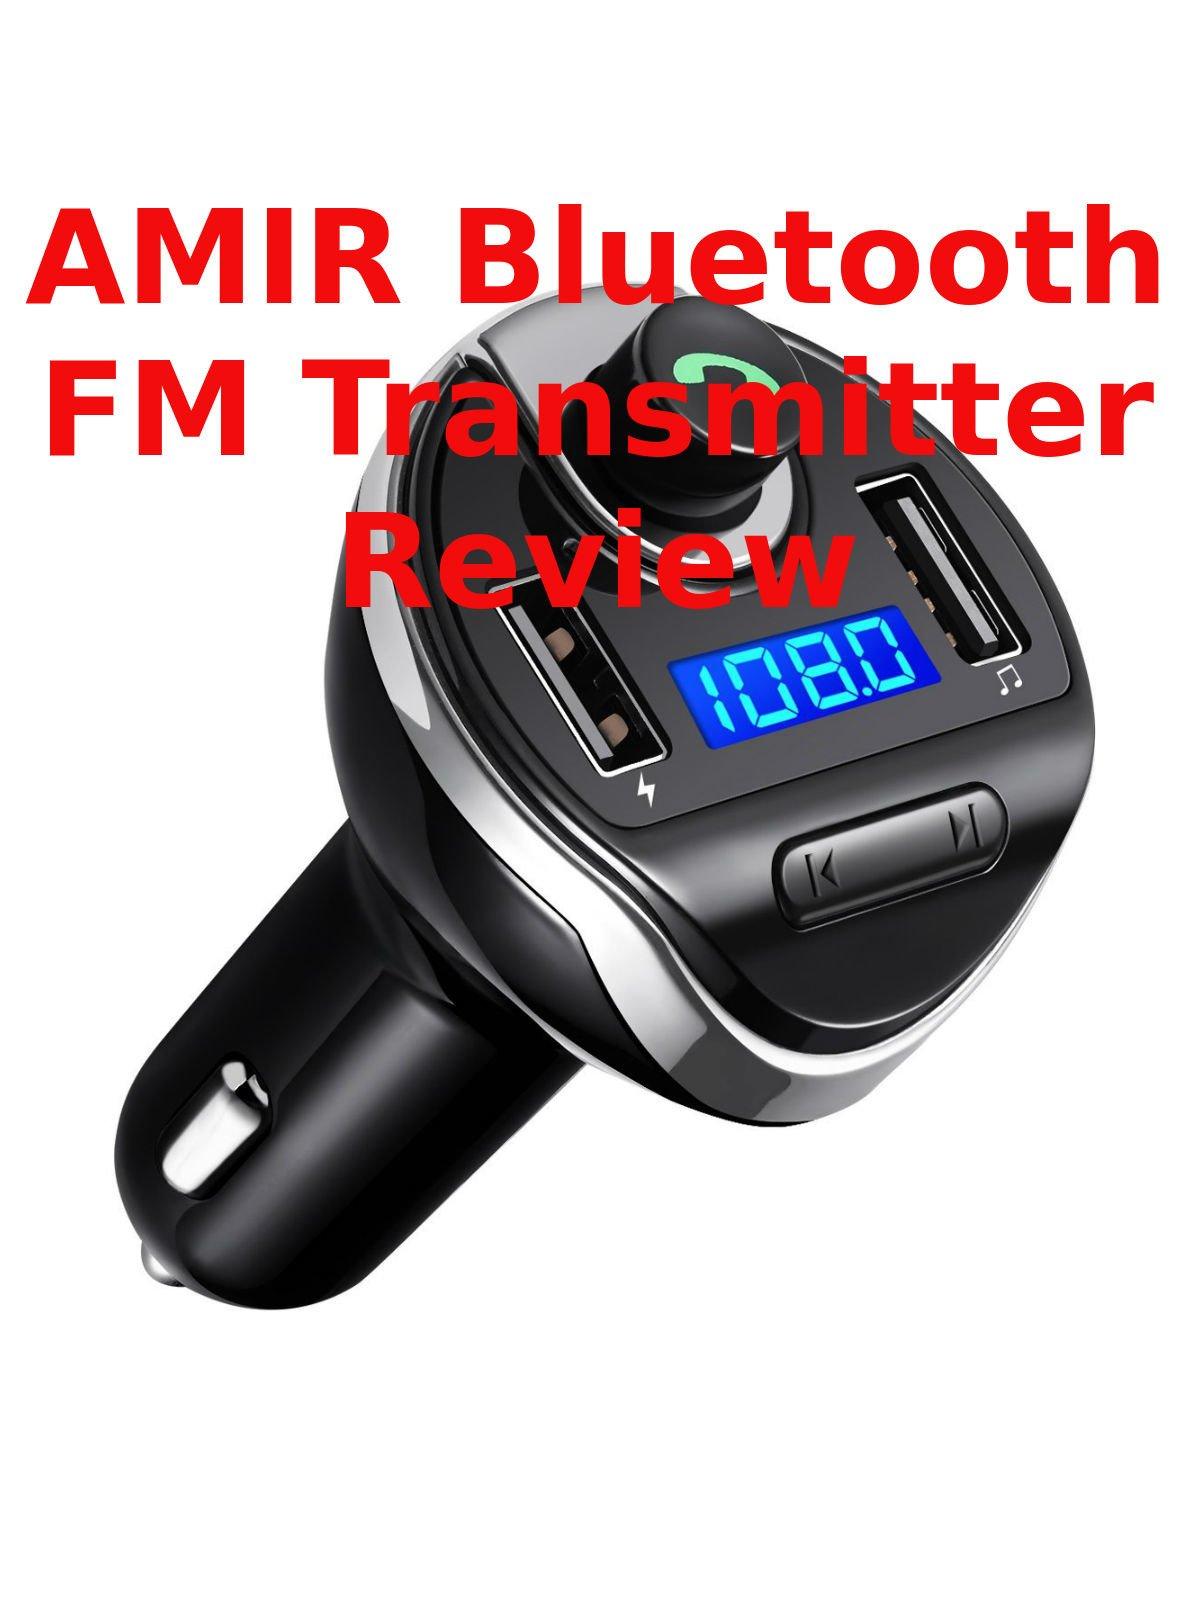 Review: Amir Bluetooth FM Transmitter Review